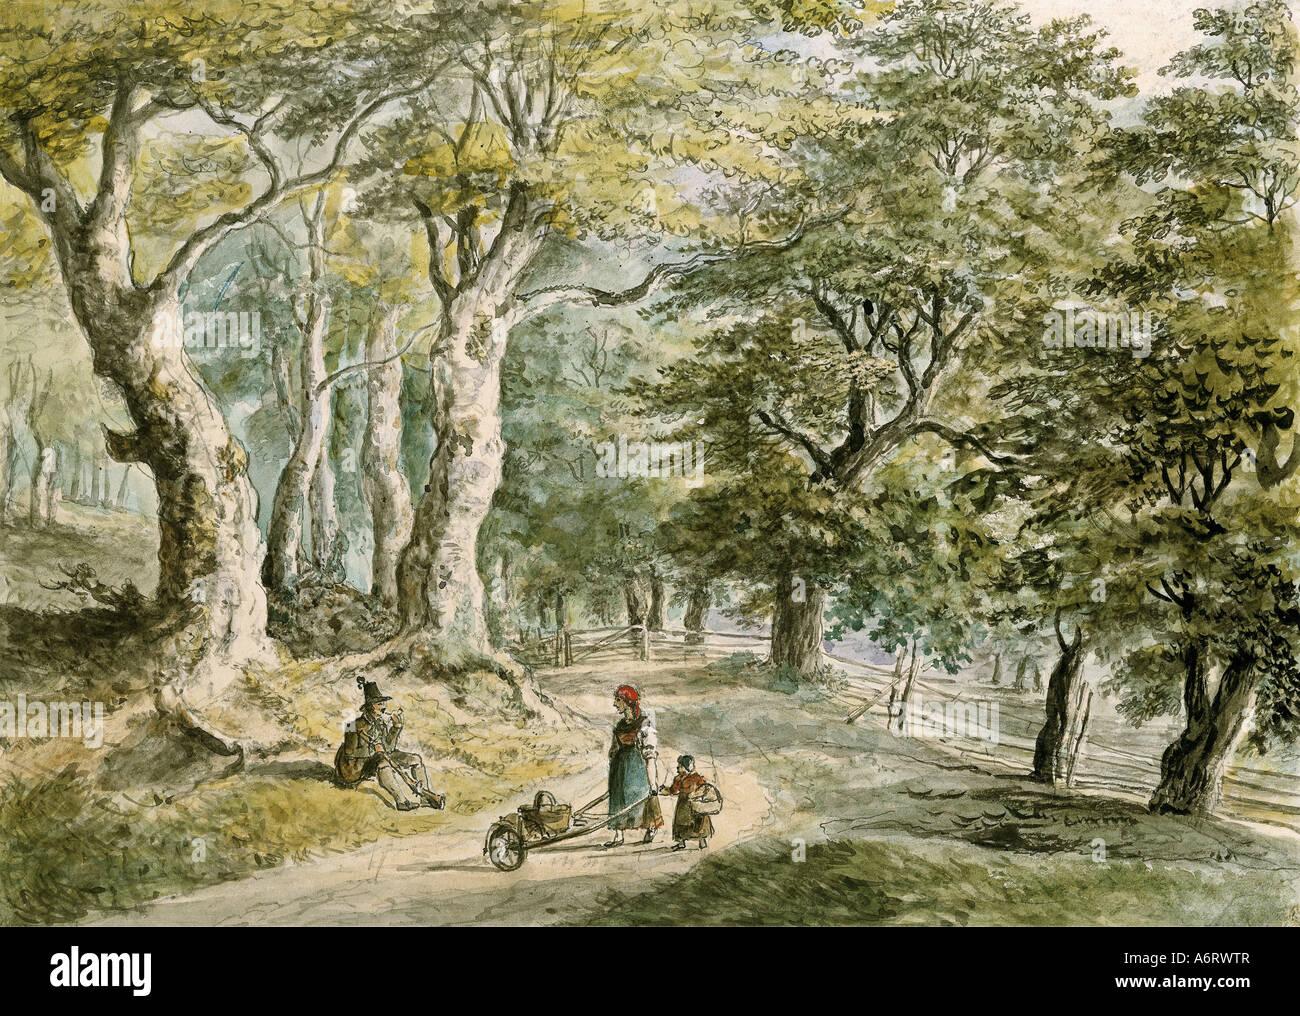 Bellas artes, Dorner, Johann Jakob, el joven (1775 - 1852), Forrest cerca Dietramszell, acuarela, 21,6x30 cm, privado Foto de stock